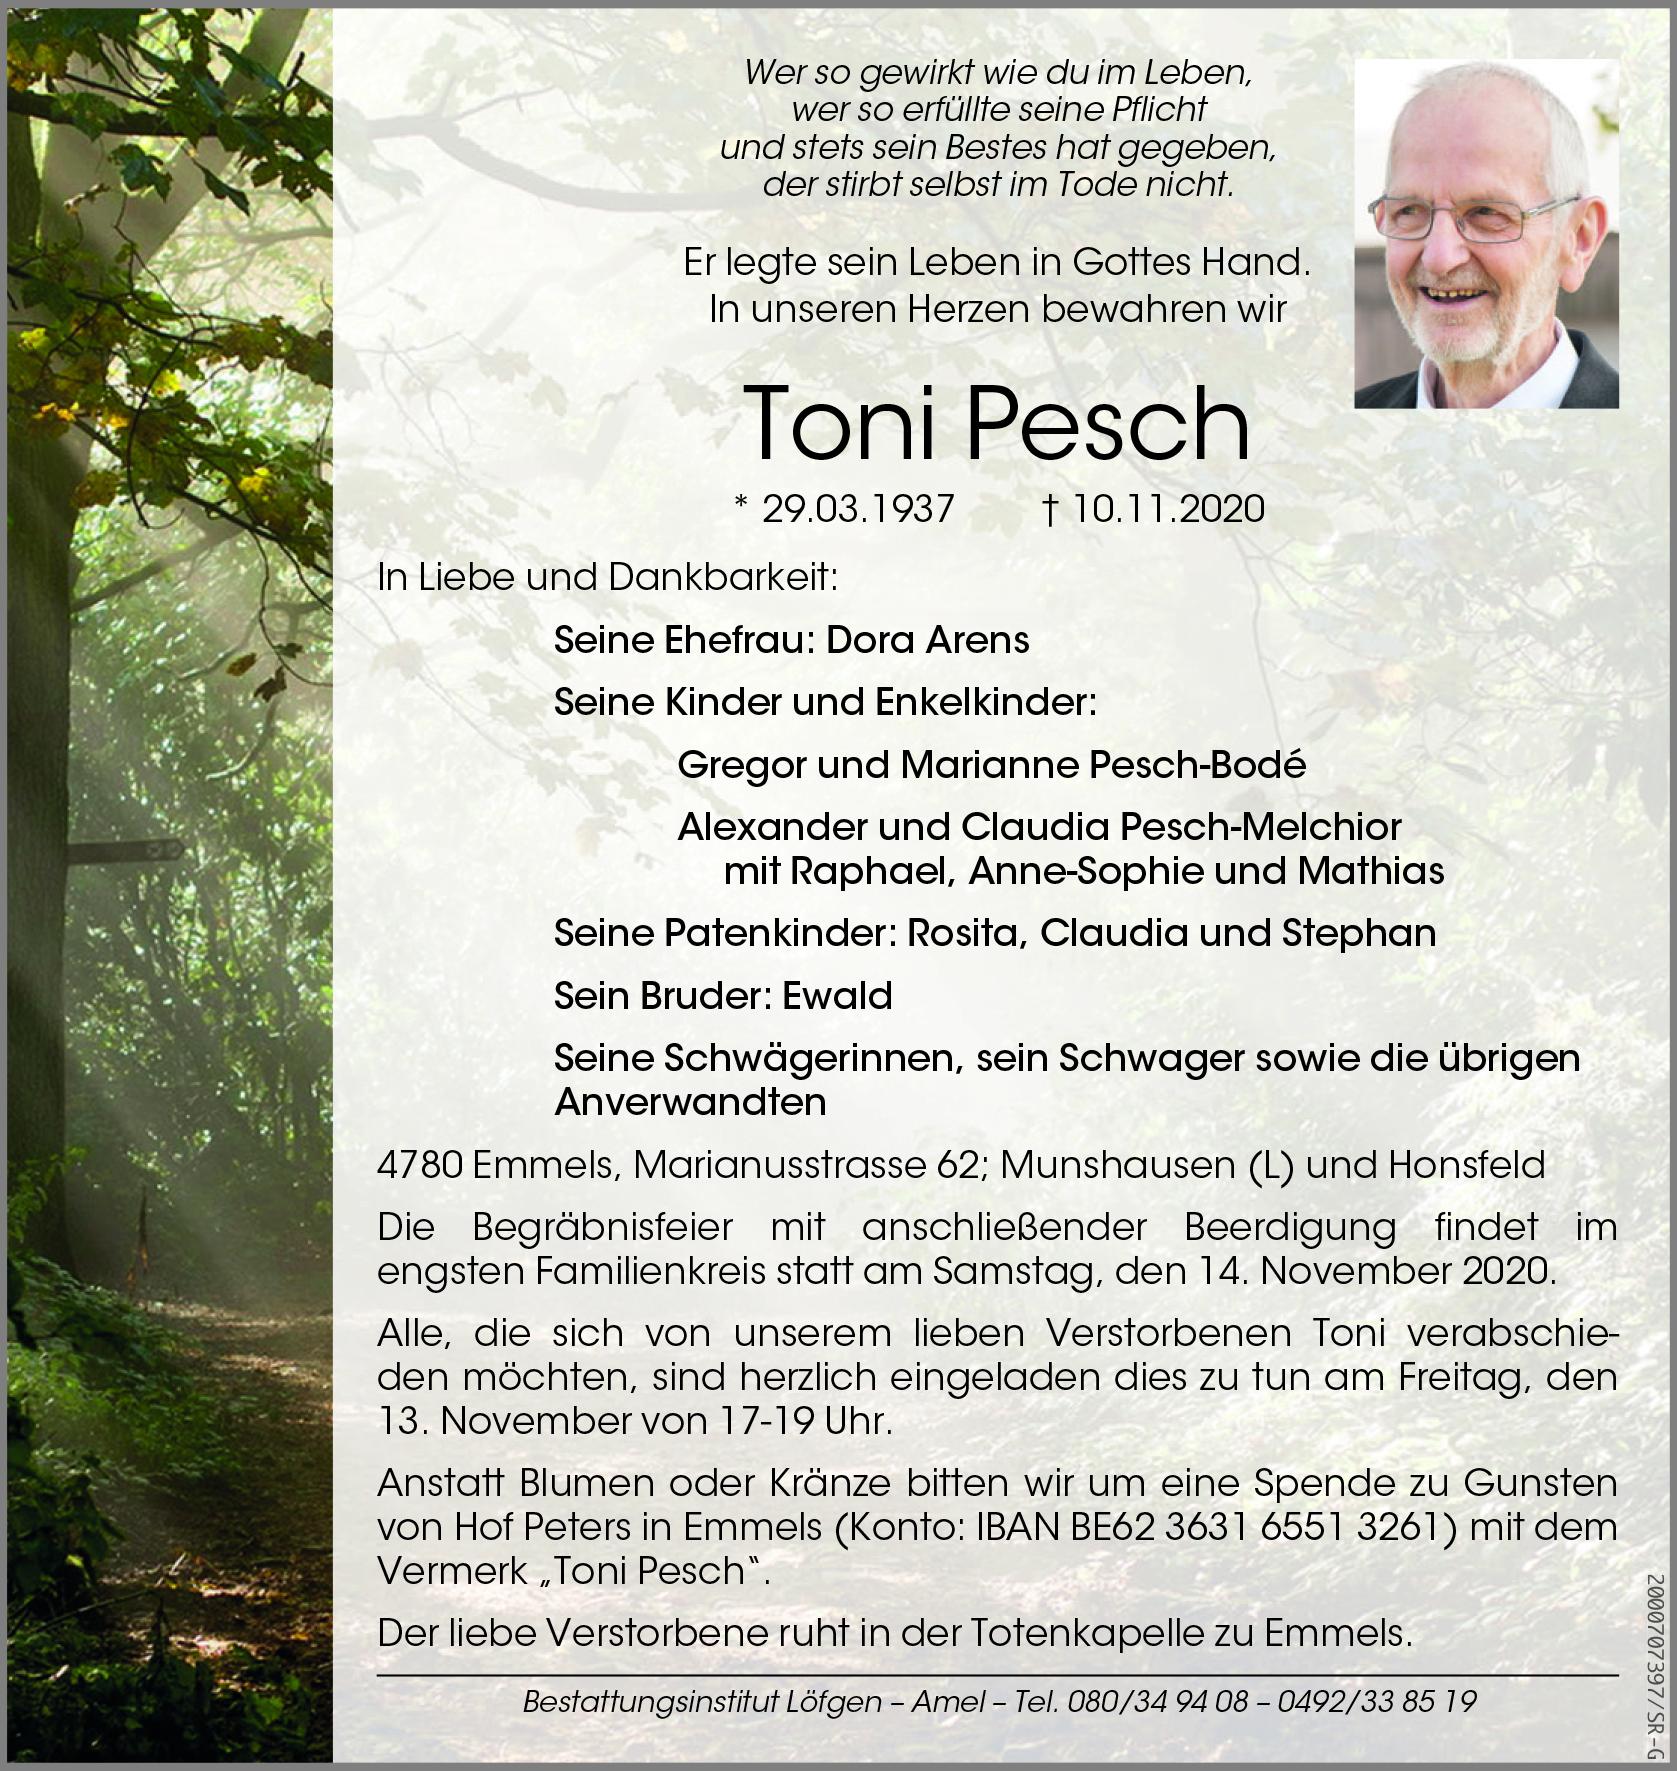 Toni Pesch